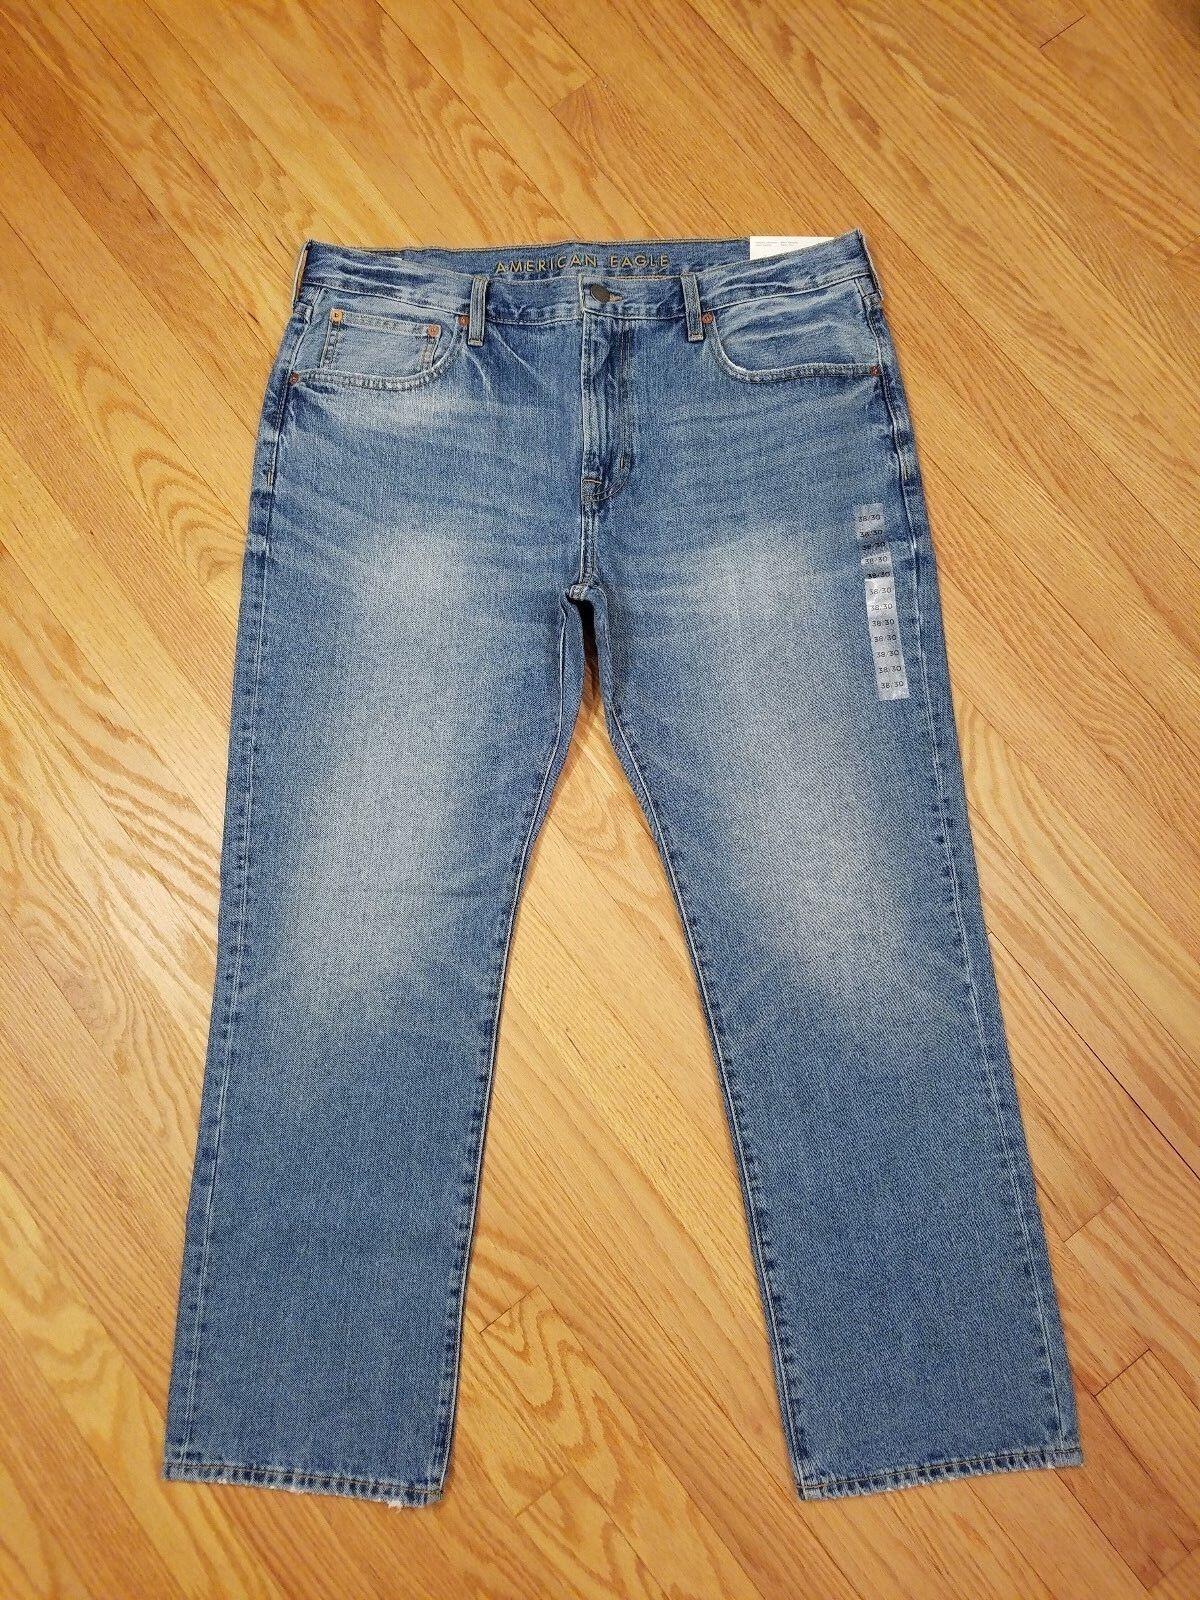 Mens NEW AE American Eagle Original Straight Light Vintage Denim Jeans 38 X 30